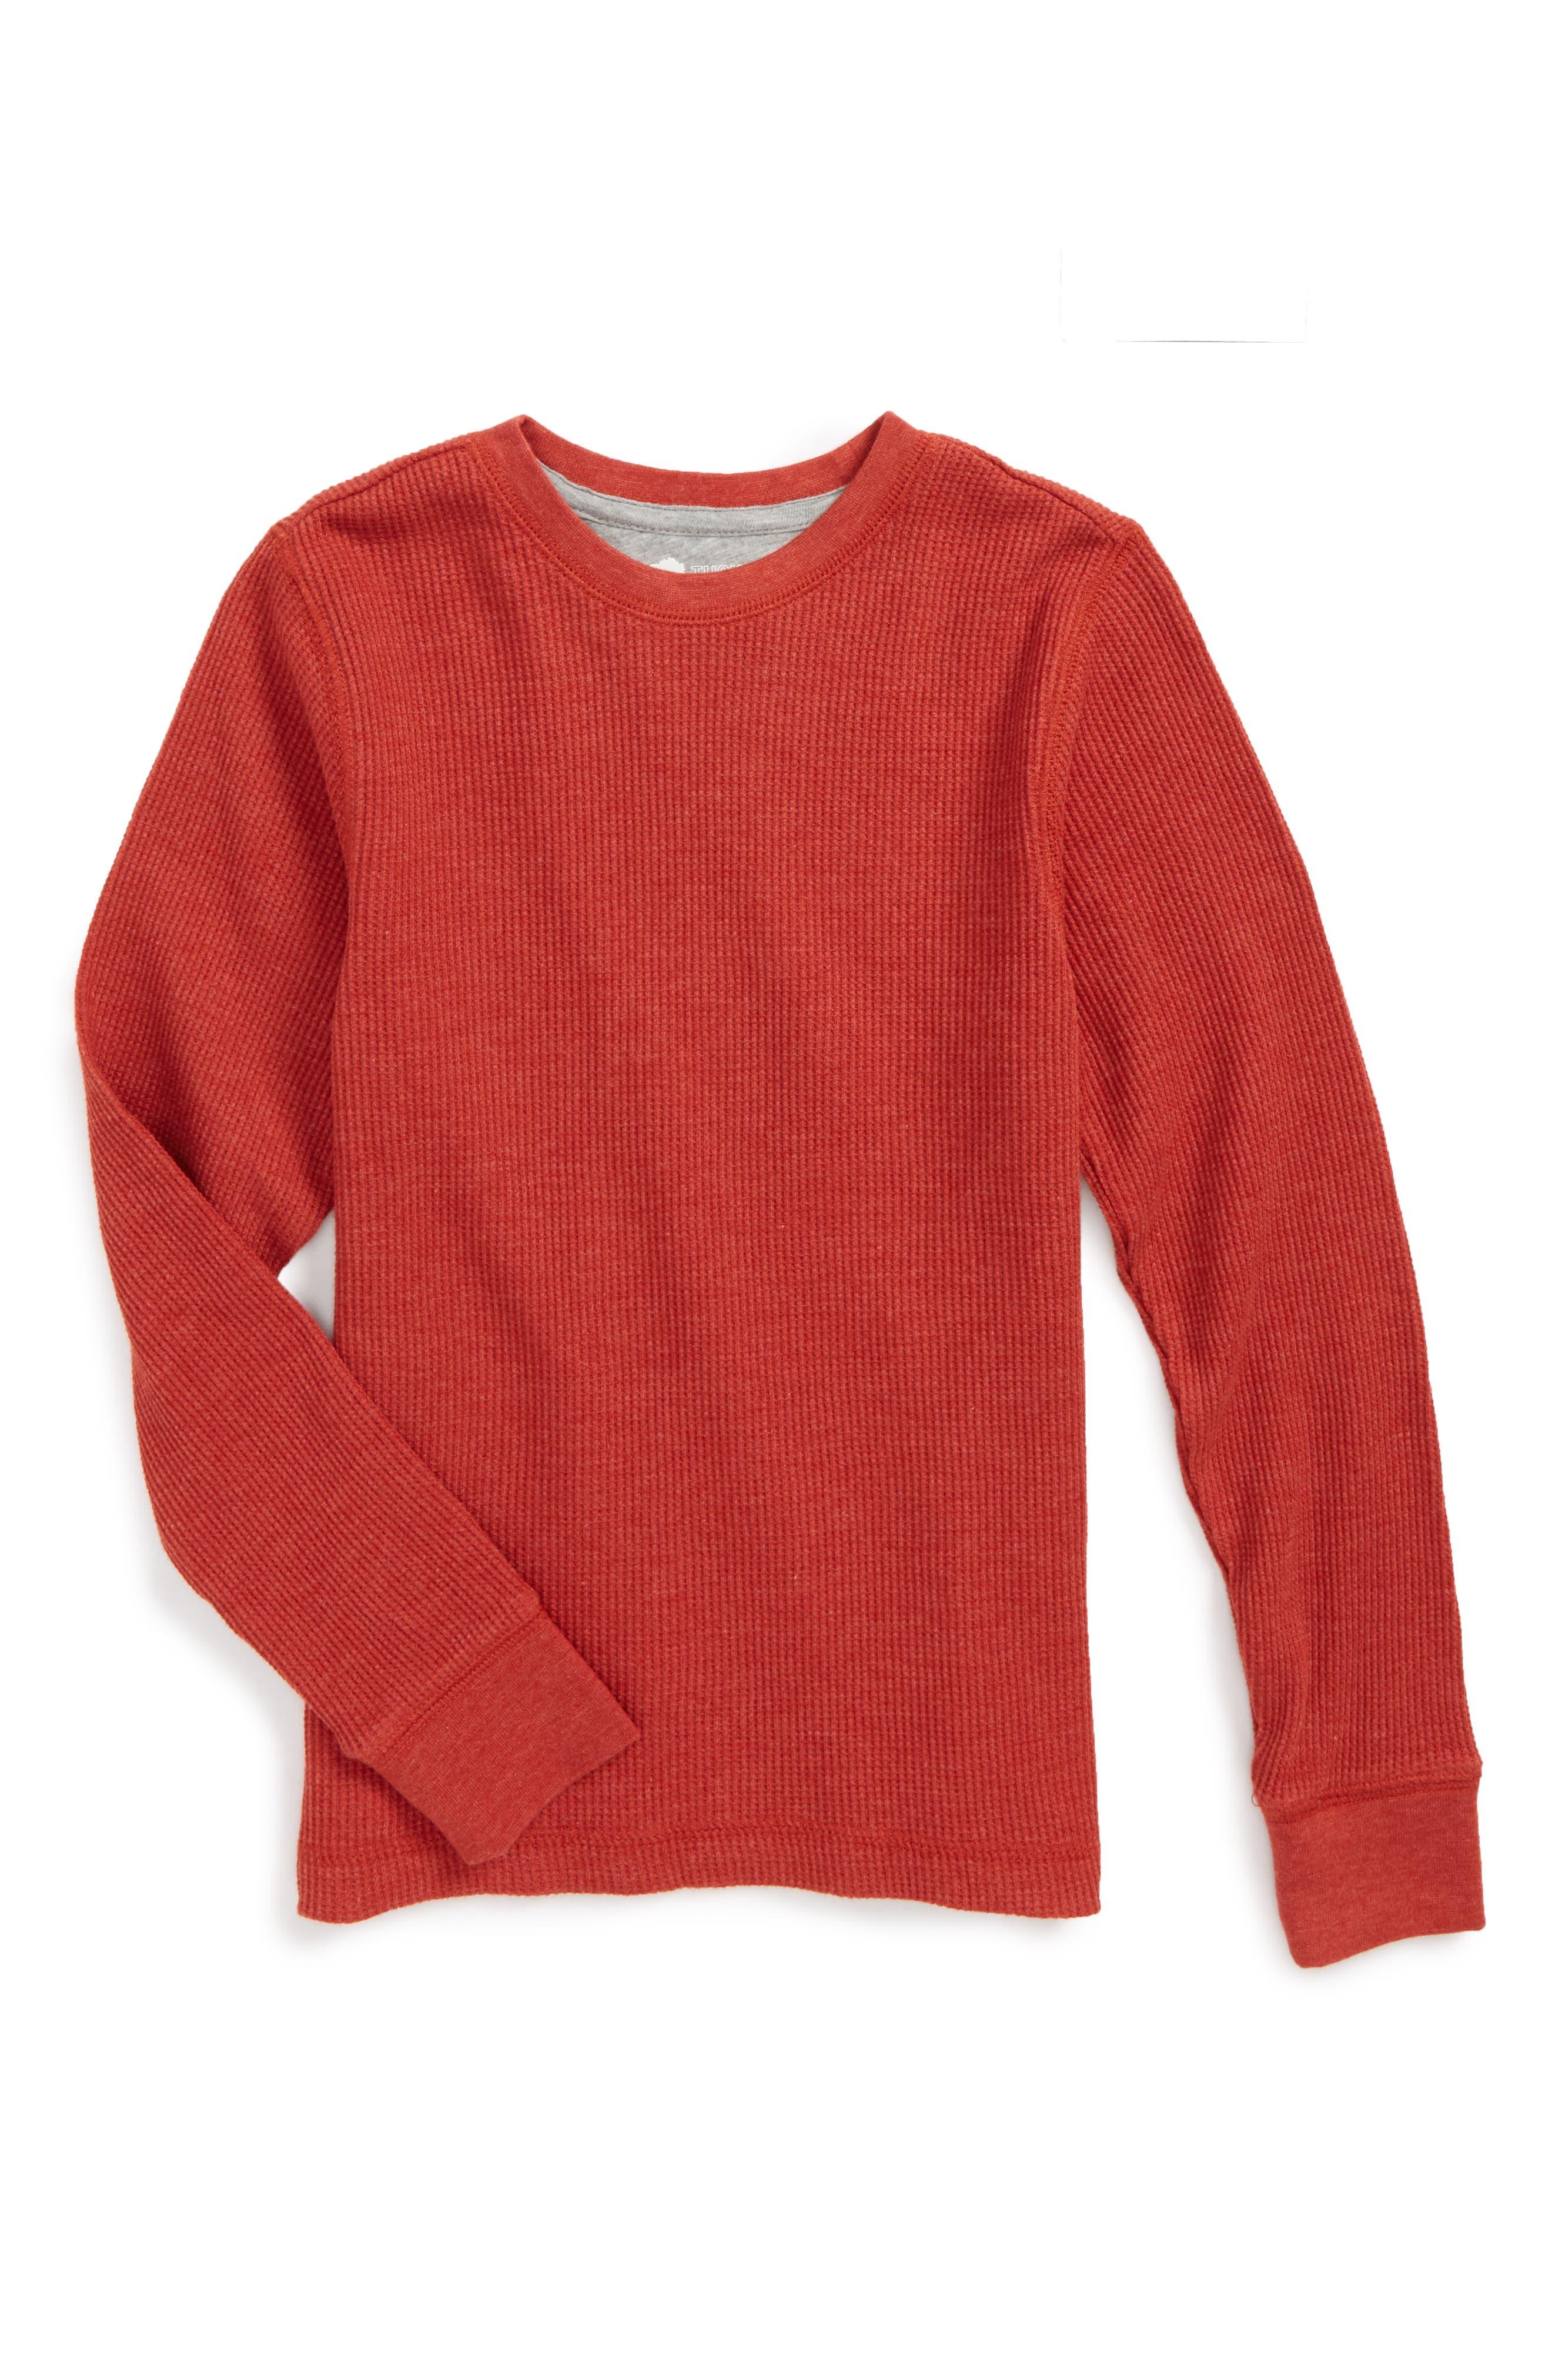 Long Sleeve Thermal T-Shirt,                             Main thumbnail 1, color,                             Rust Bossa Nova